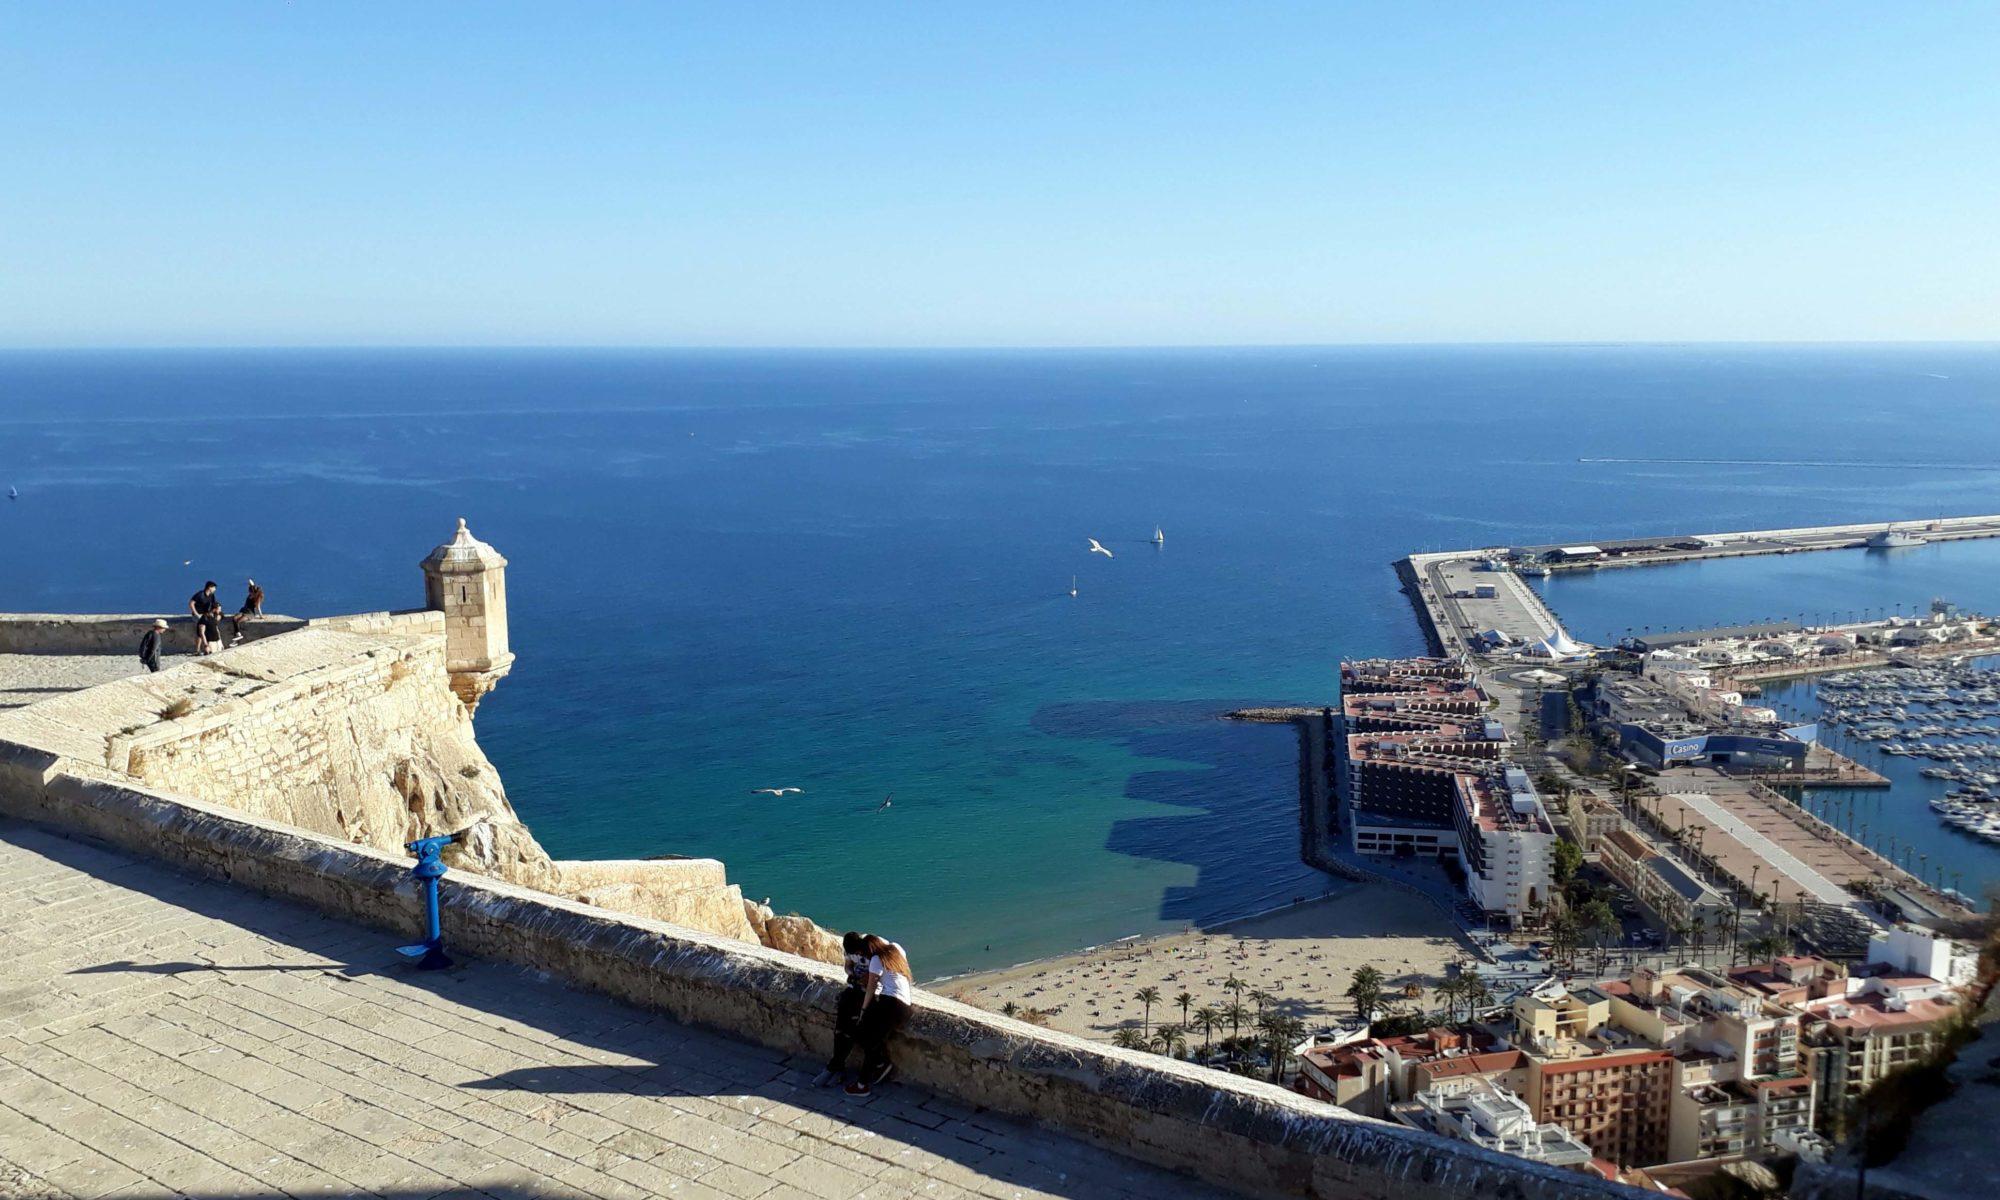 1 Tag in Alicante: Stadtspaziergang & Essen